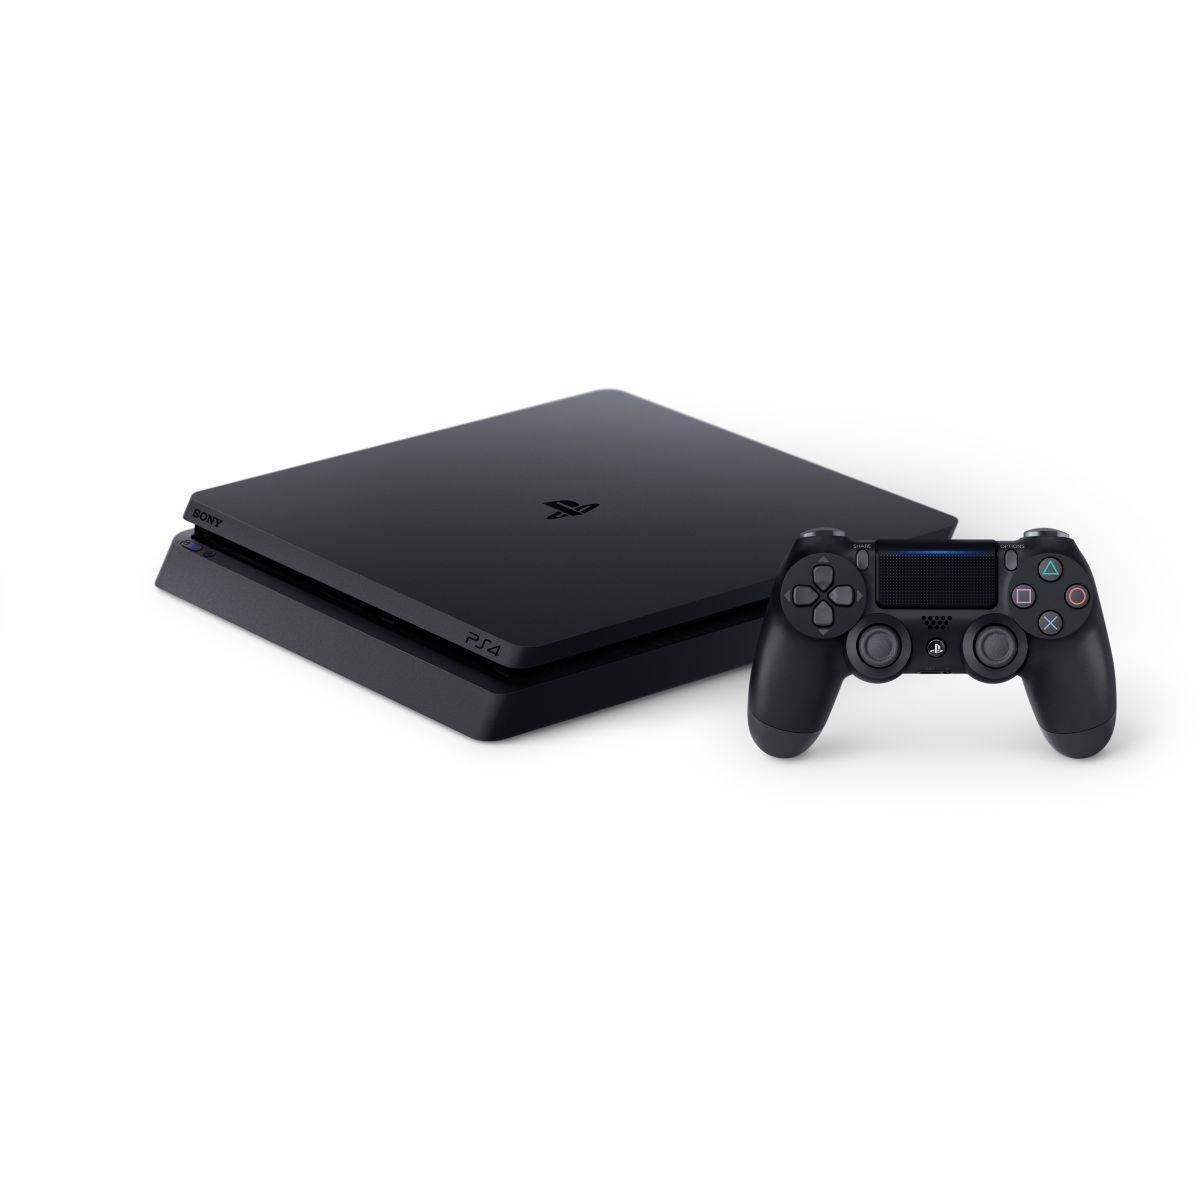 PlayStation 4 Slim - HDD 500 GB - Negro